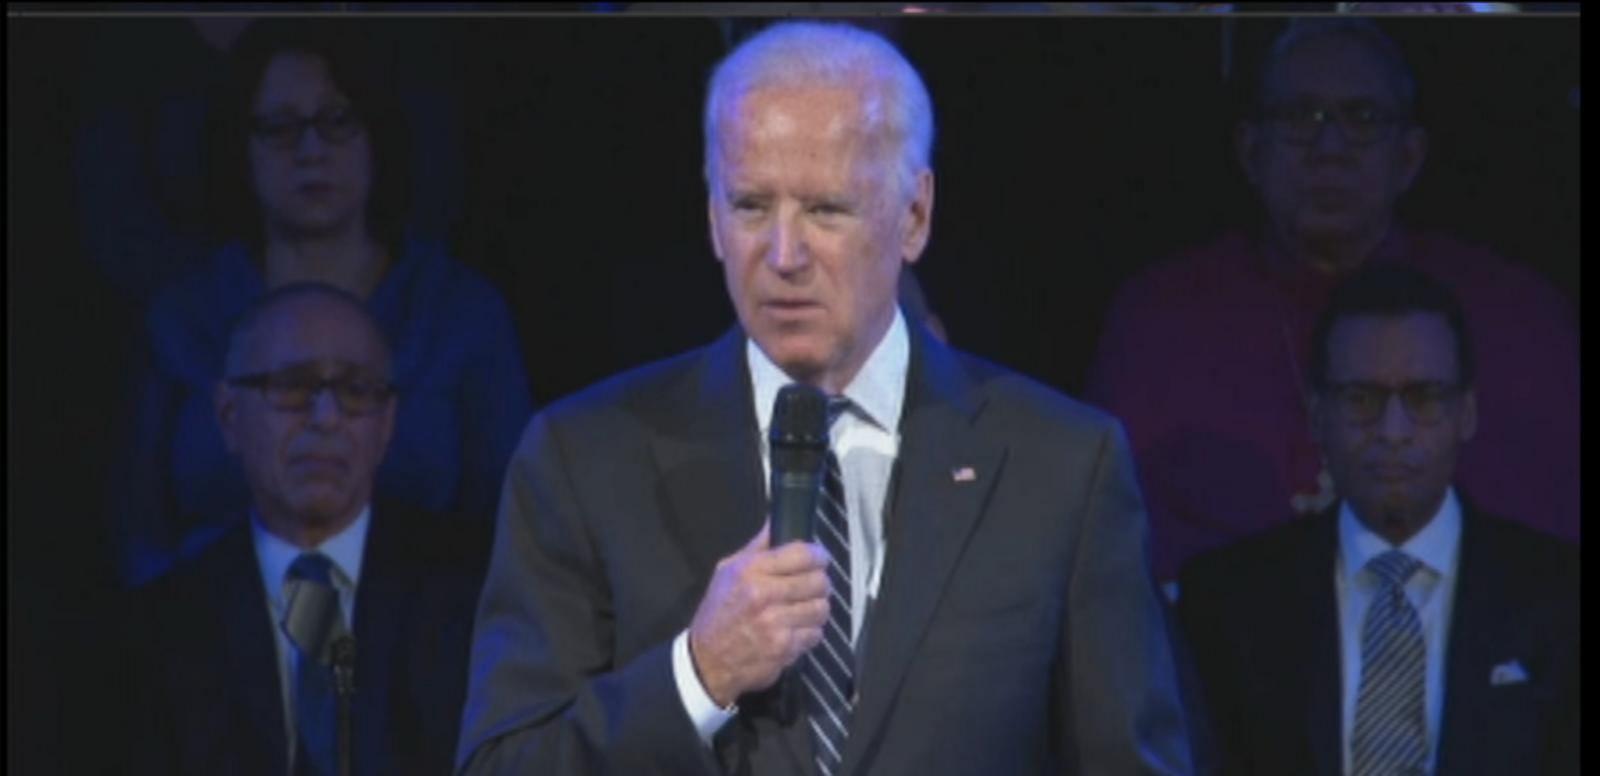 VIDEO: VP Joe Biden Delivers Remarks at Slain NYPD Officer's Funeral